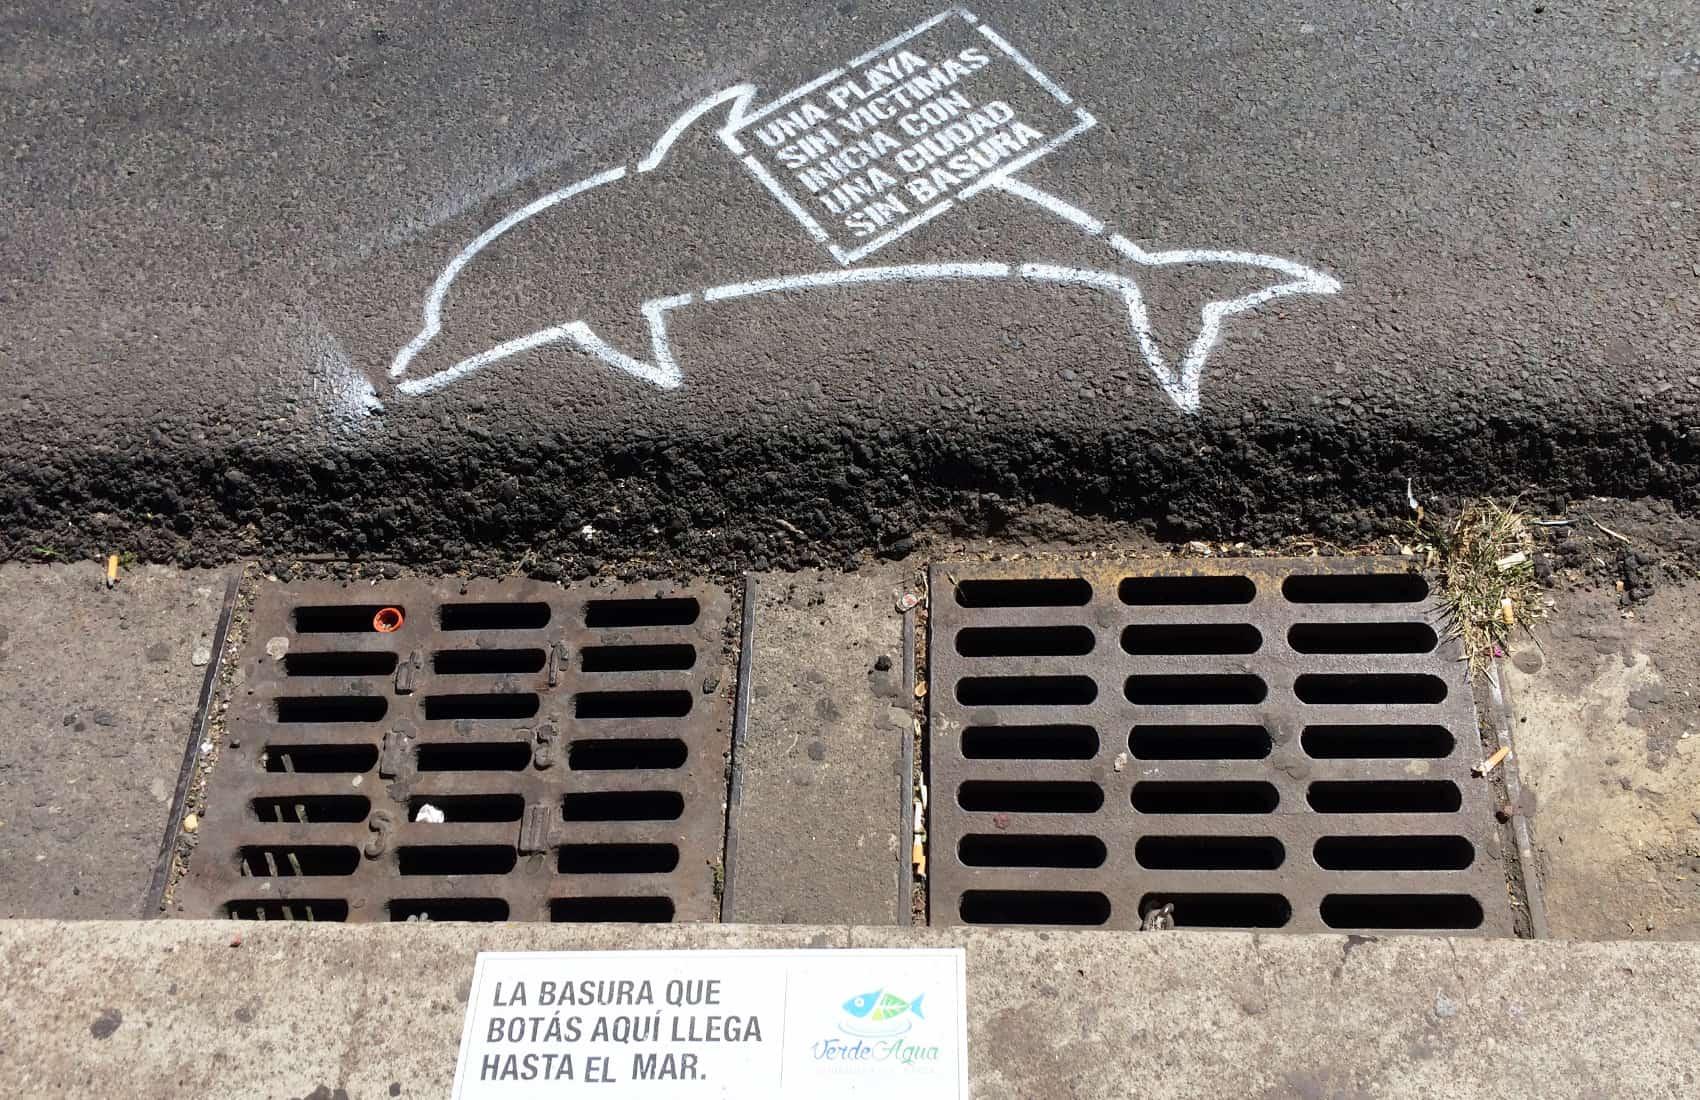 Fundación Verde Agua awareness campaign in downtown San José. Jan. 19, 2017.